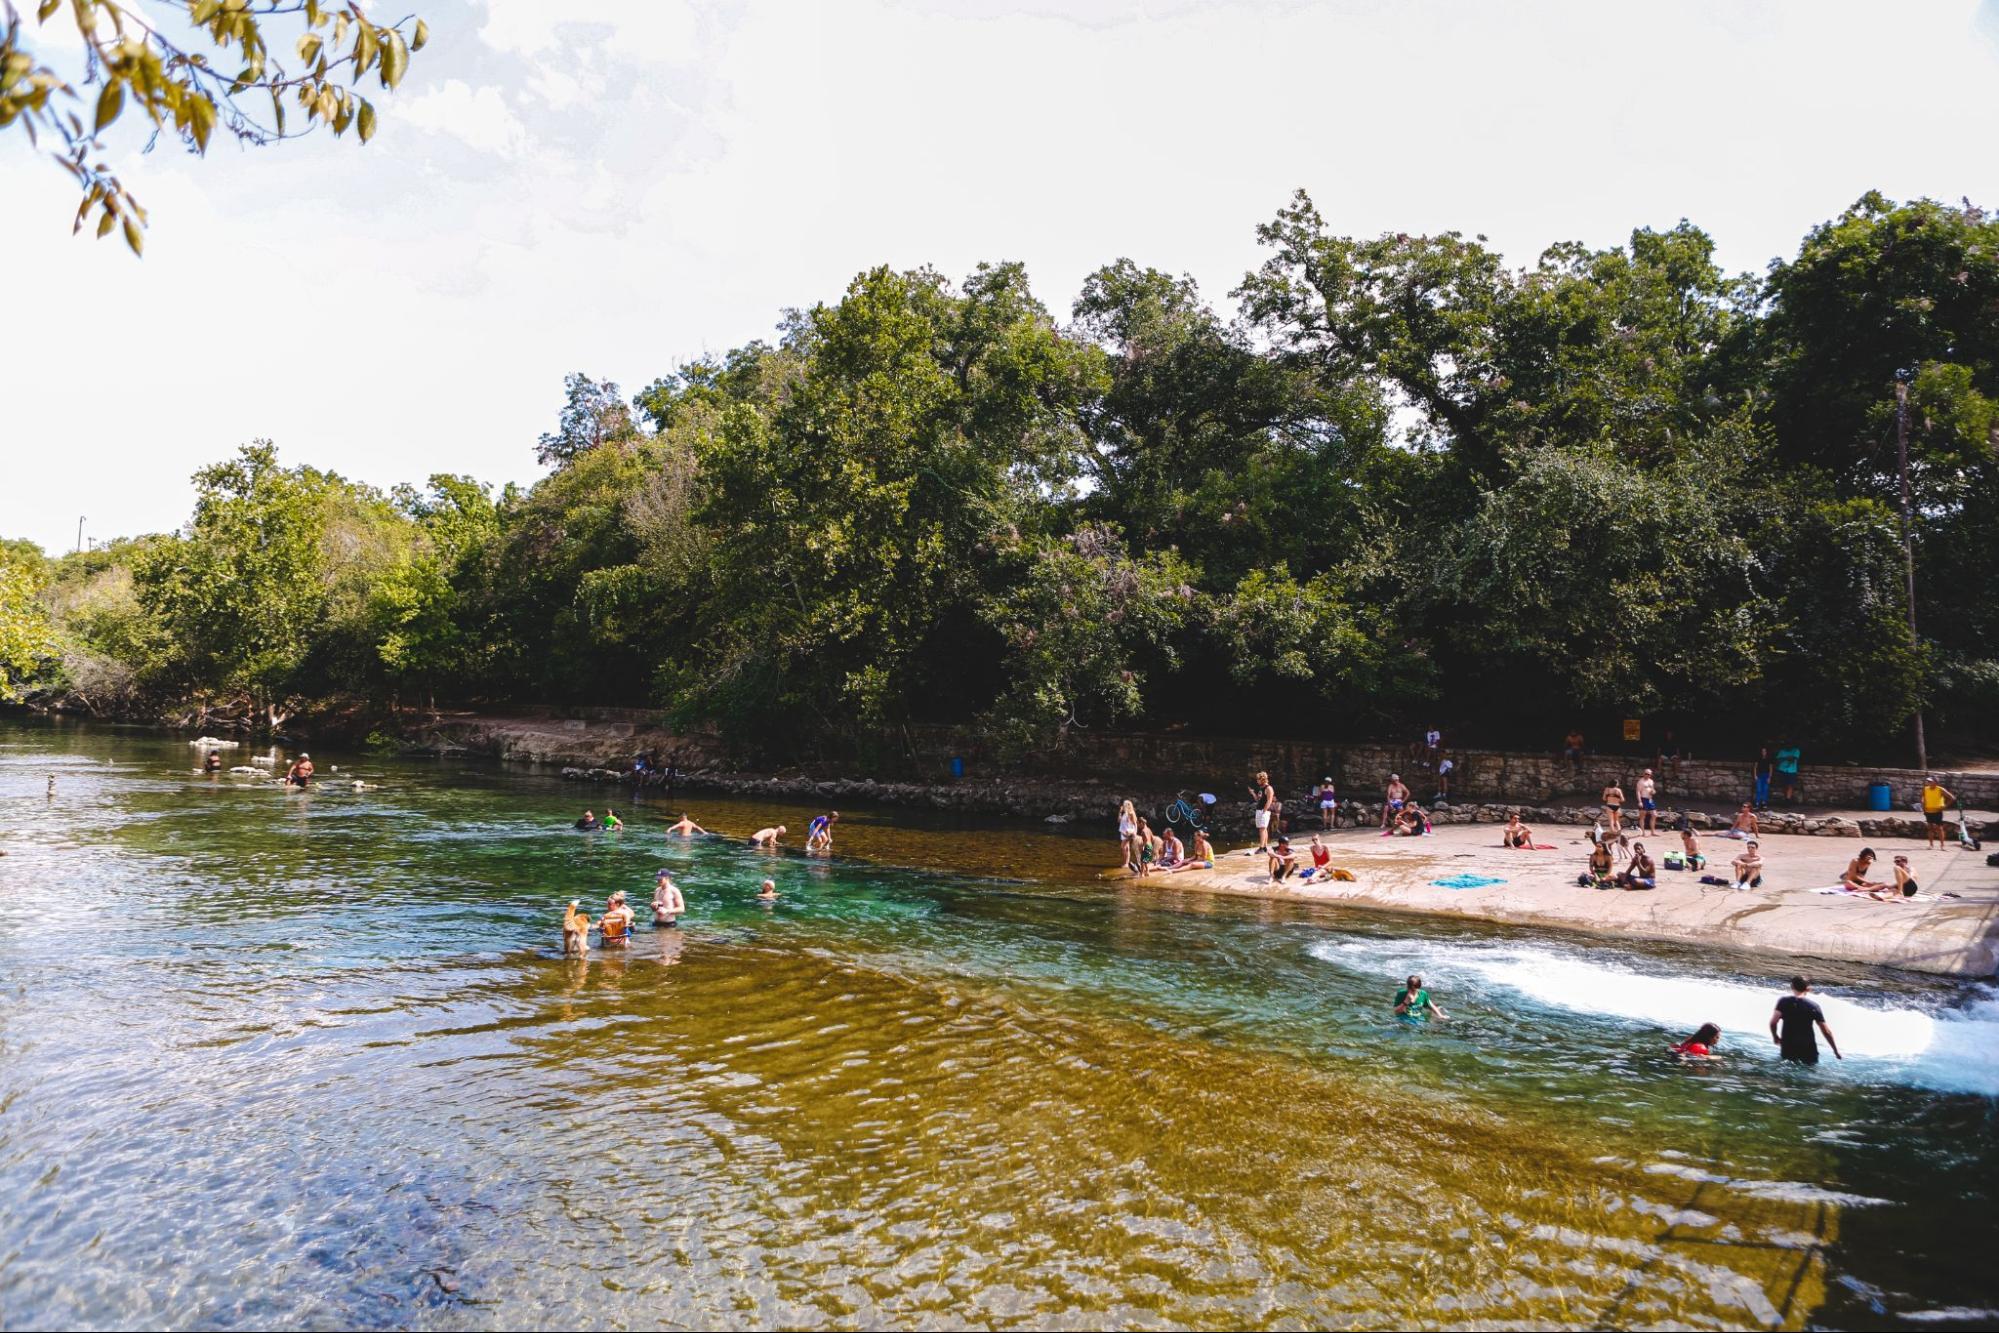 Barton Springs Creek in Austin, Texas